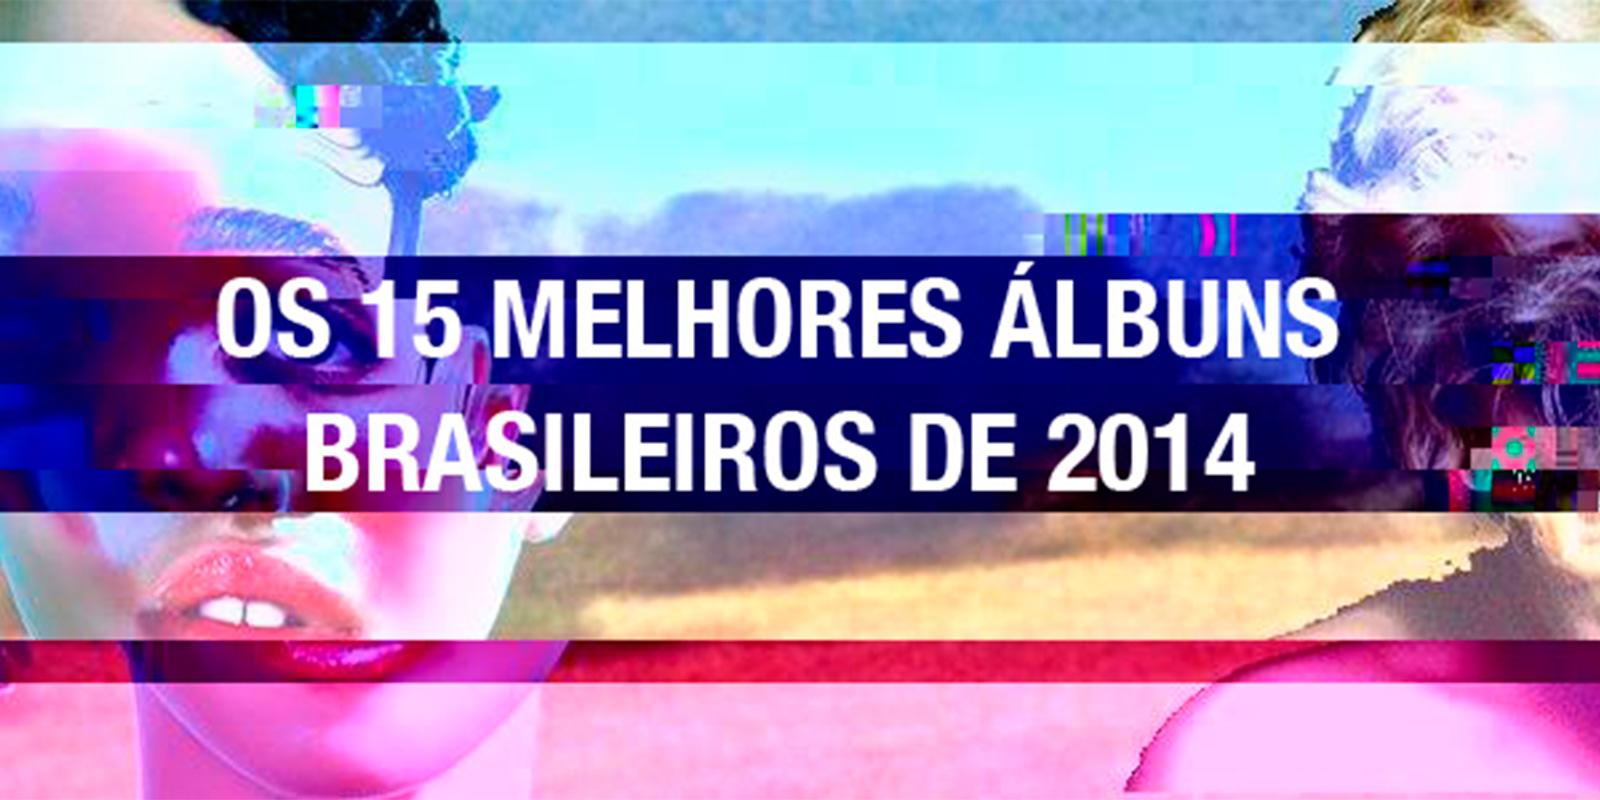 Os 15 Melhores Álbuns Brasileiros de 2014 post image